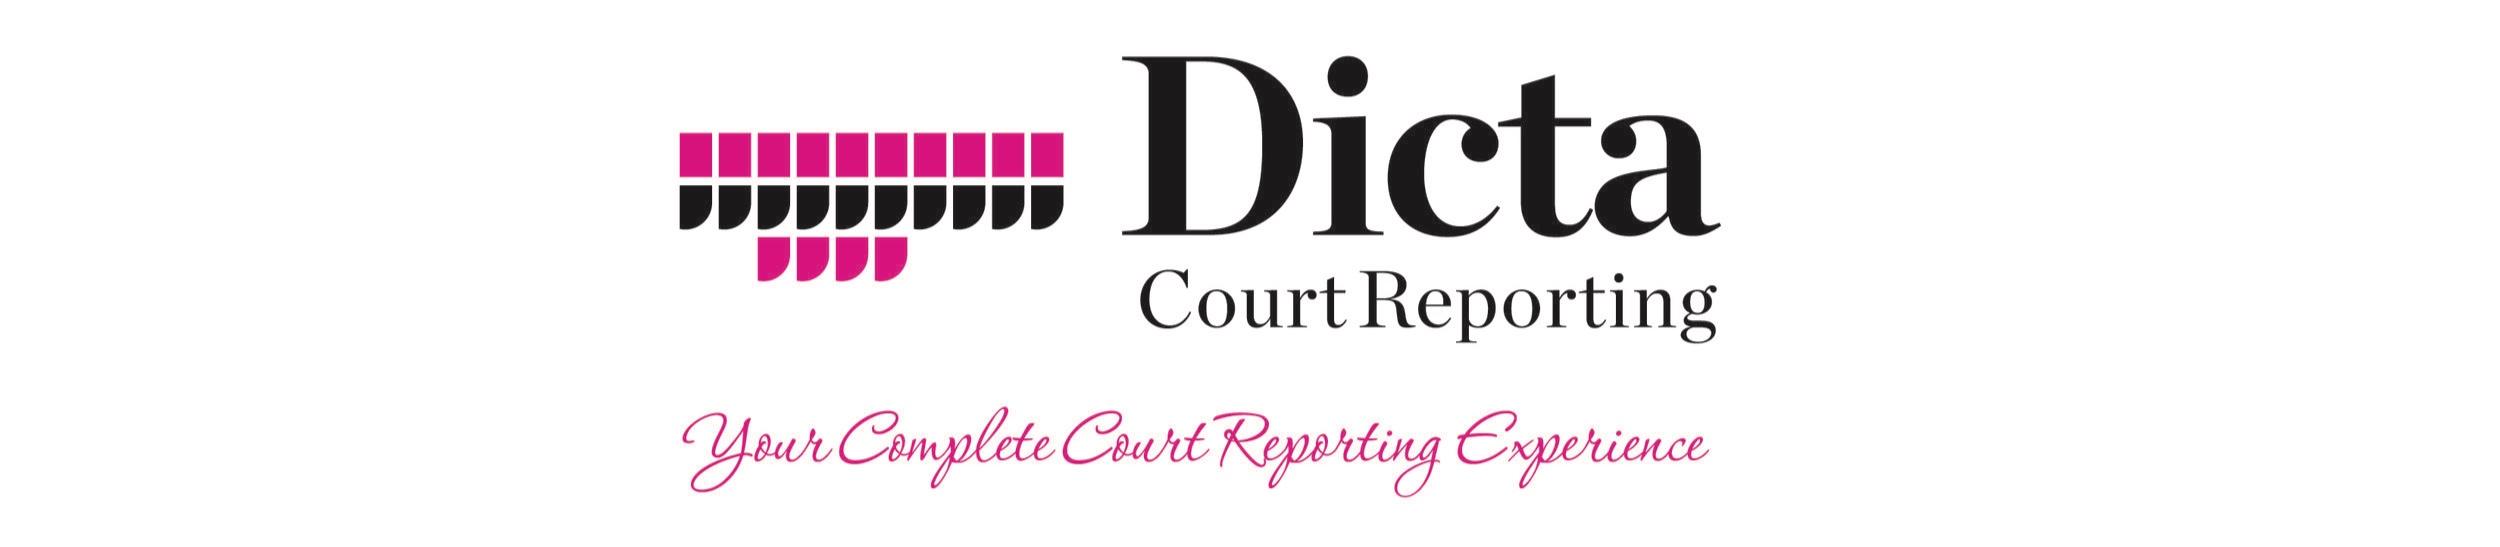 DictaCR.jpg